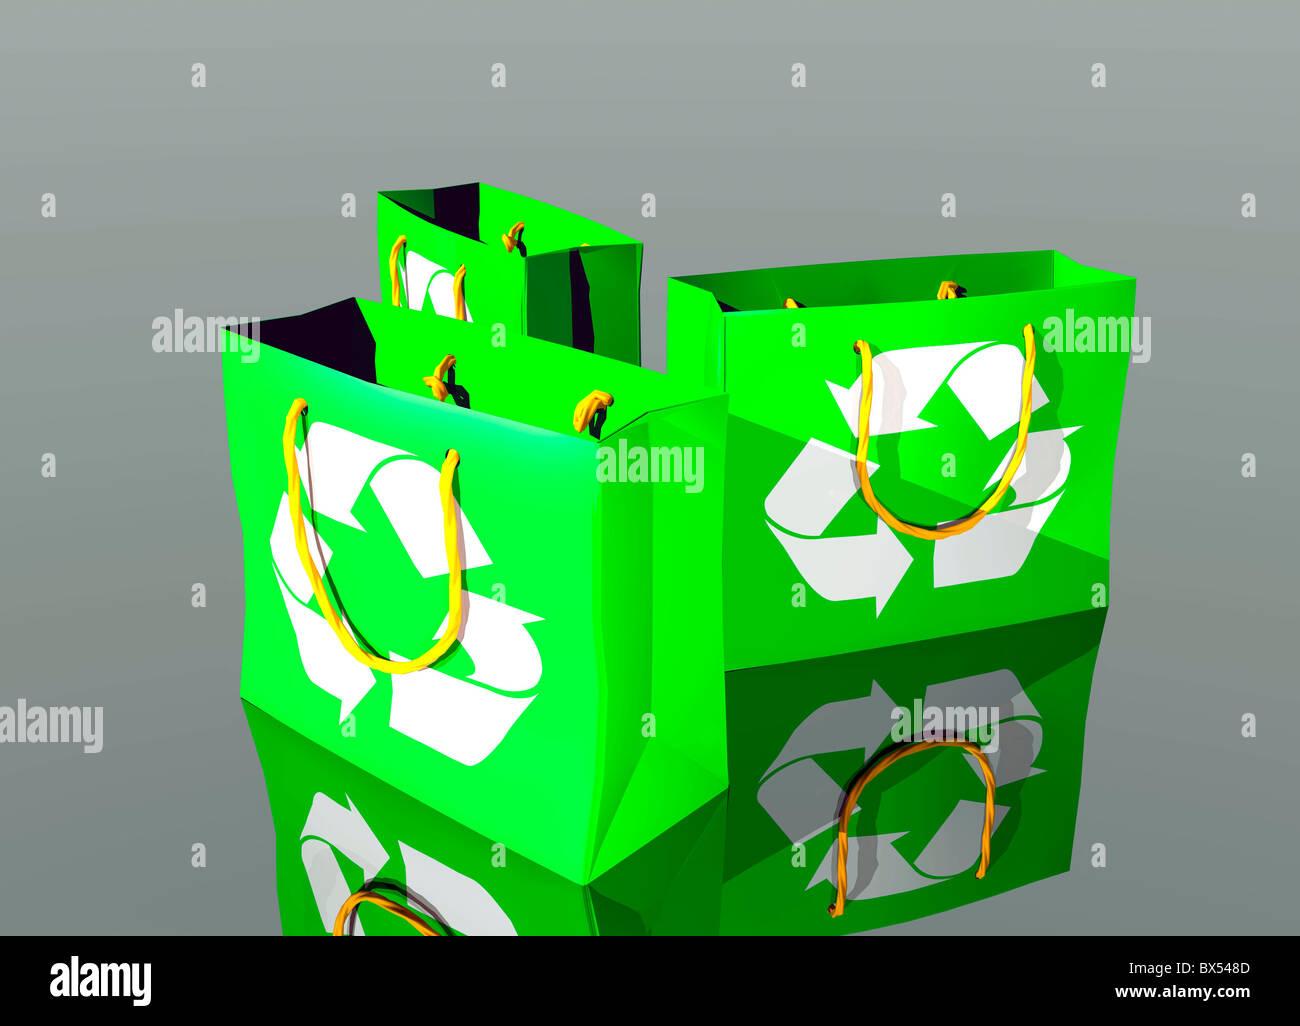 Reusable shopping bags, artwork - Stock Image